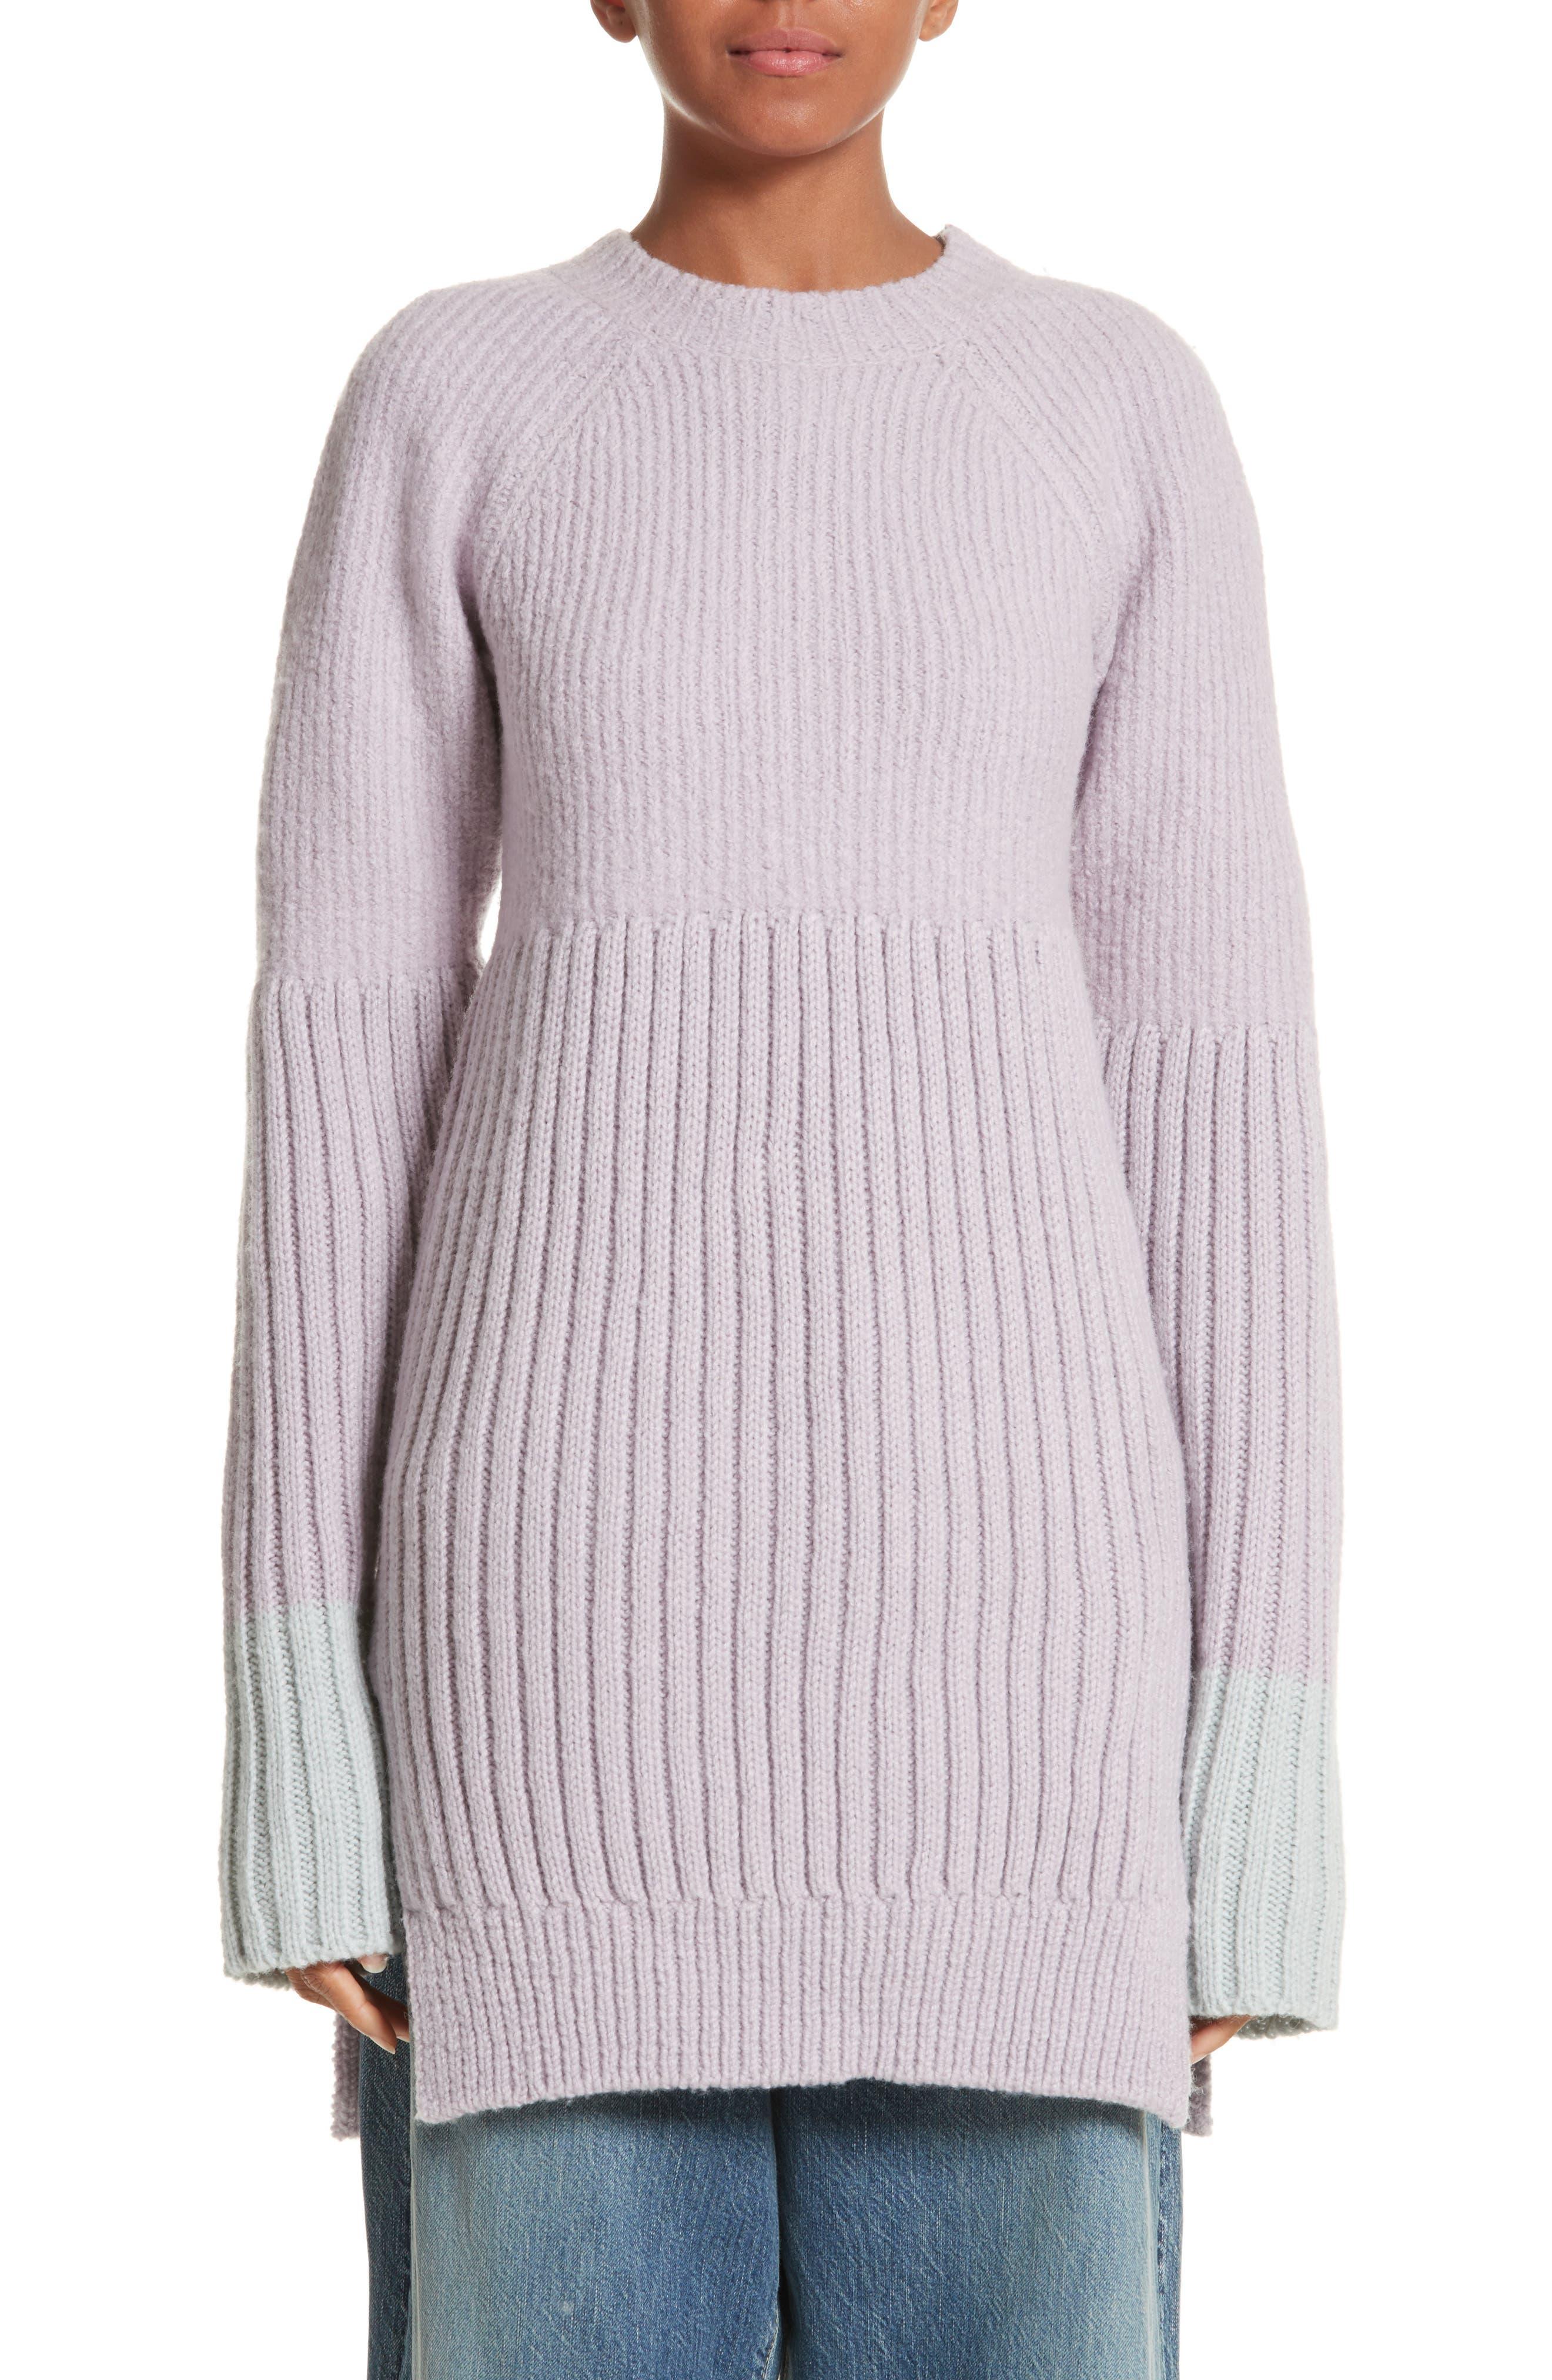 Main Image - Undercover Wool Tunic Sweater